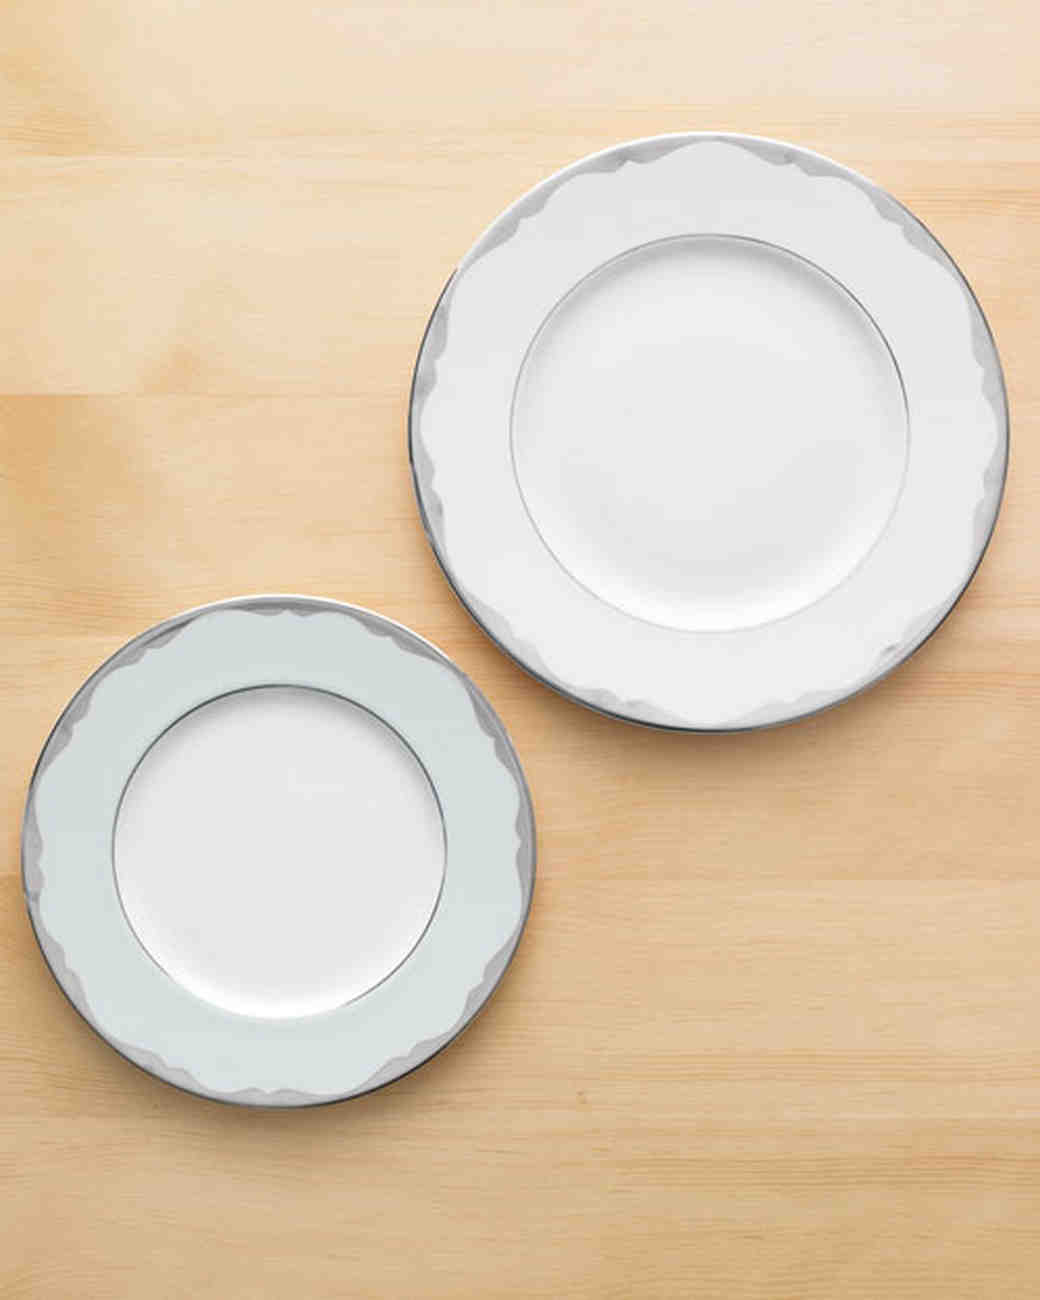 mld106509_spr11_plates01.jpg